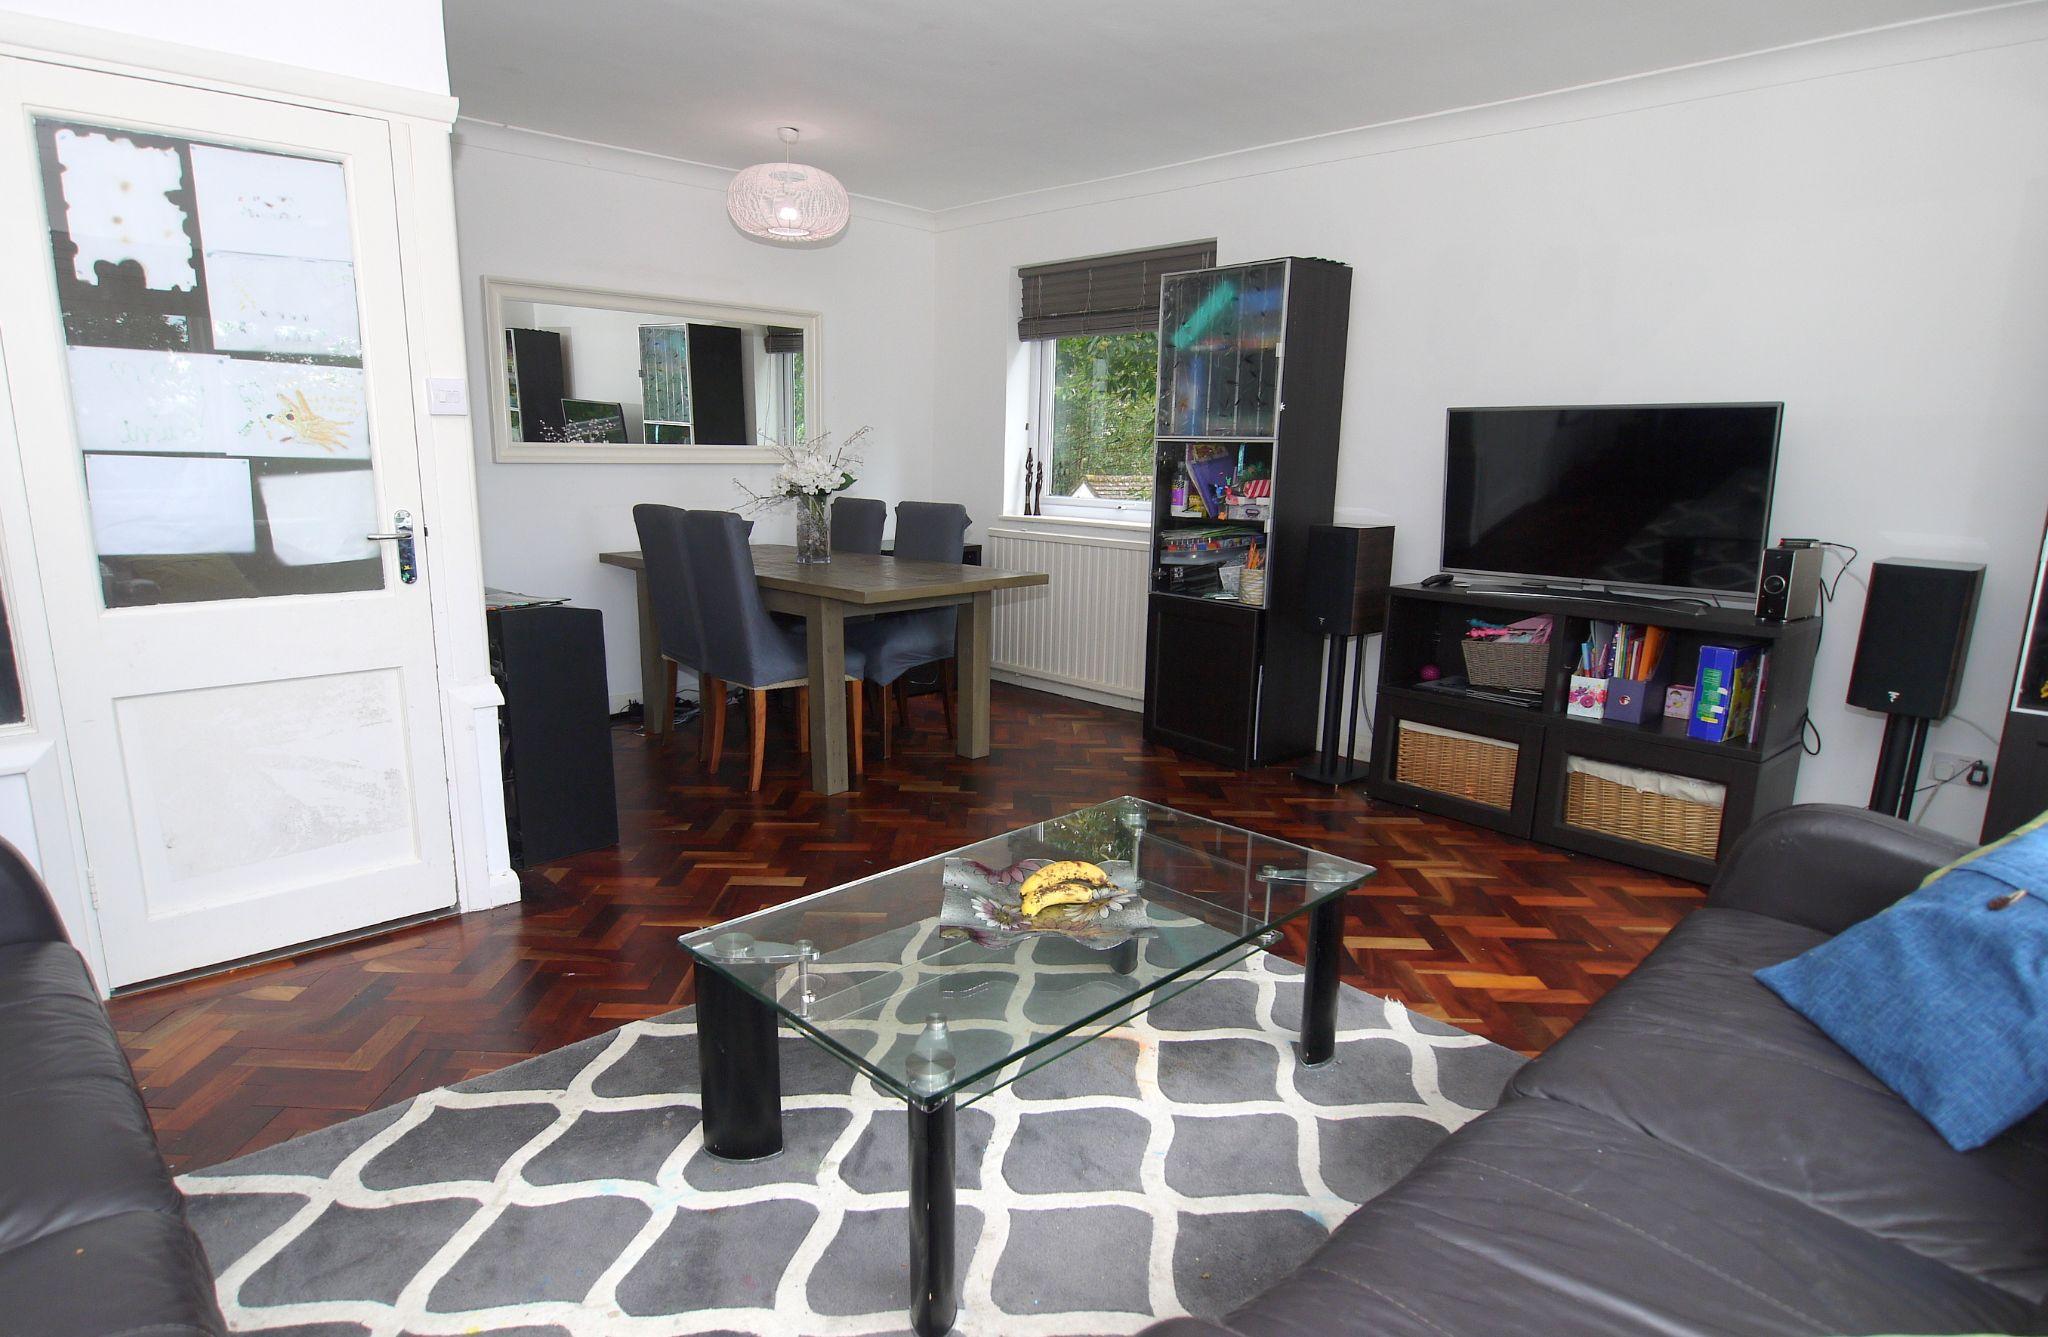 3 bedroom apartment Sale Agreed in Sevenoaks - Photograph 3